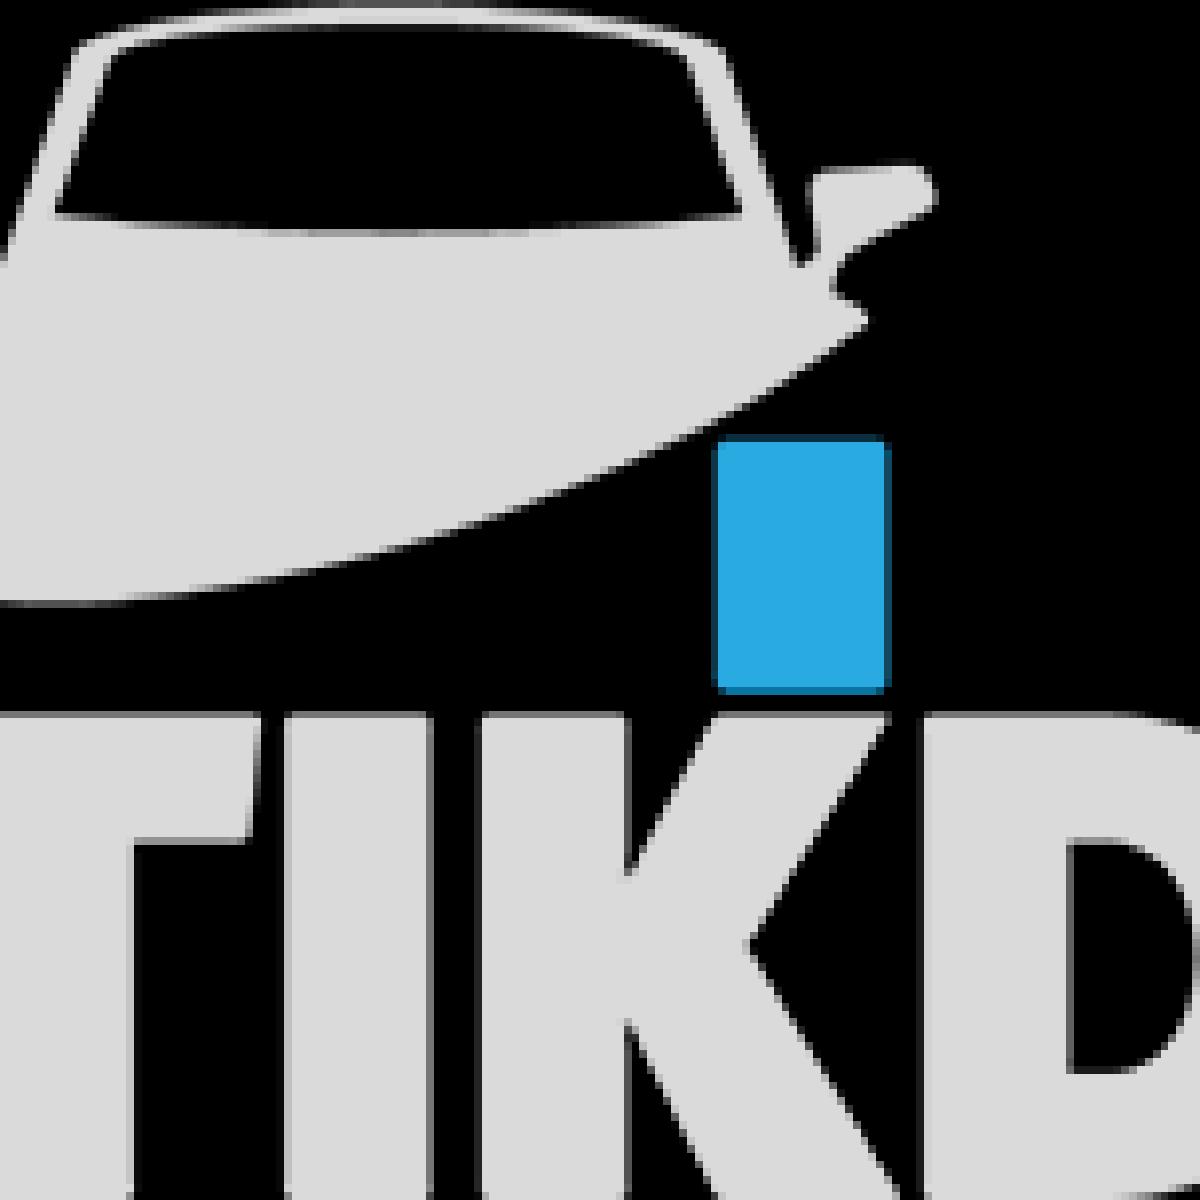 New traffic ticket app Tikd launches in Atlanta | Northside / Sandy